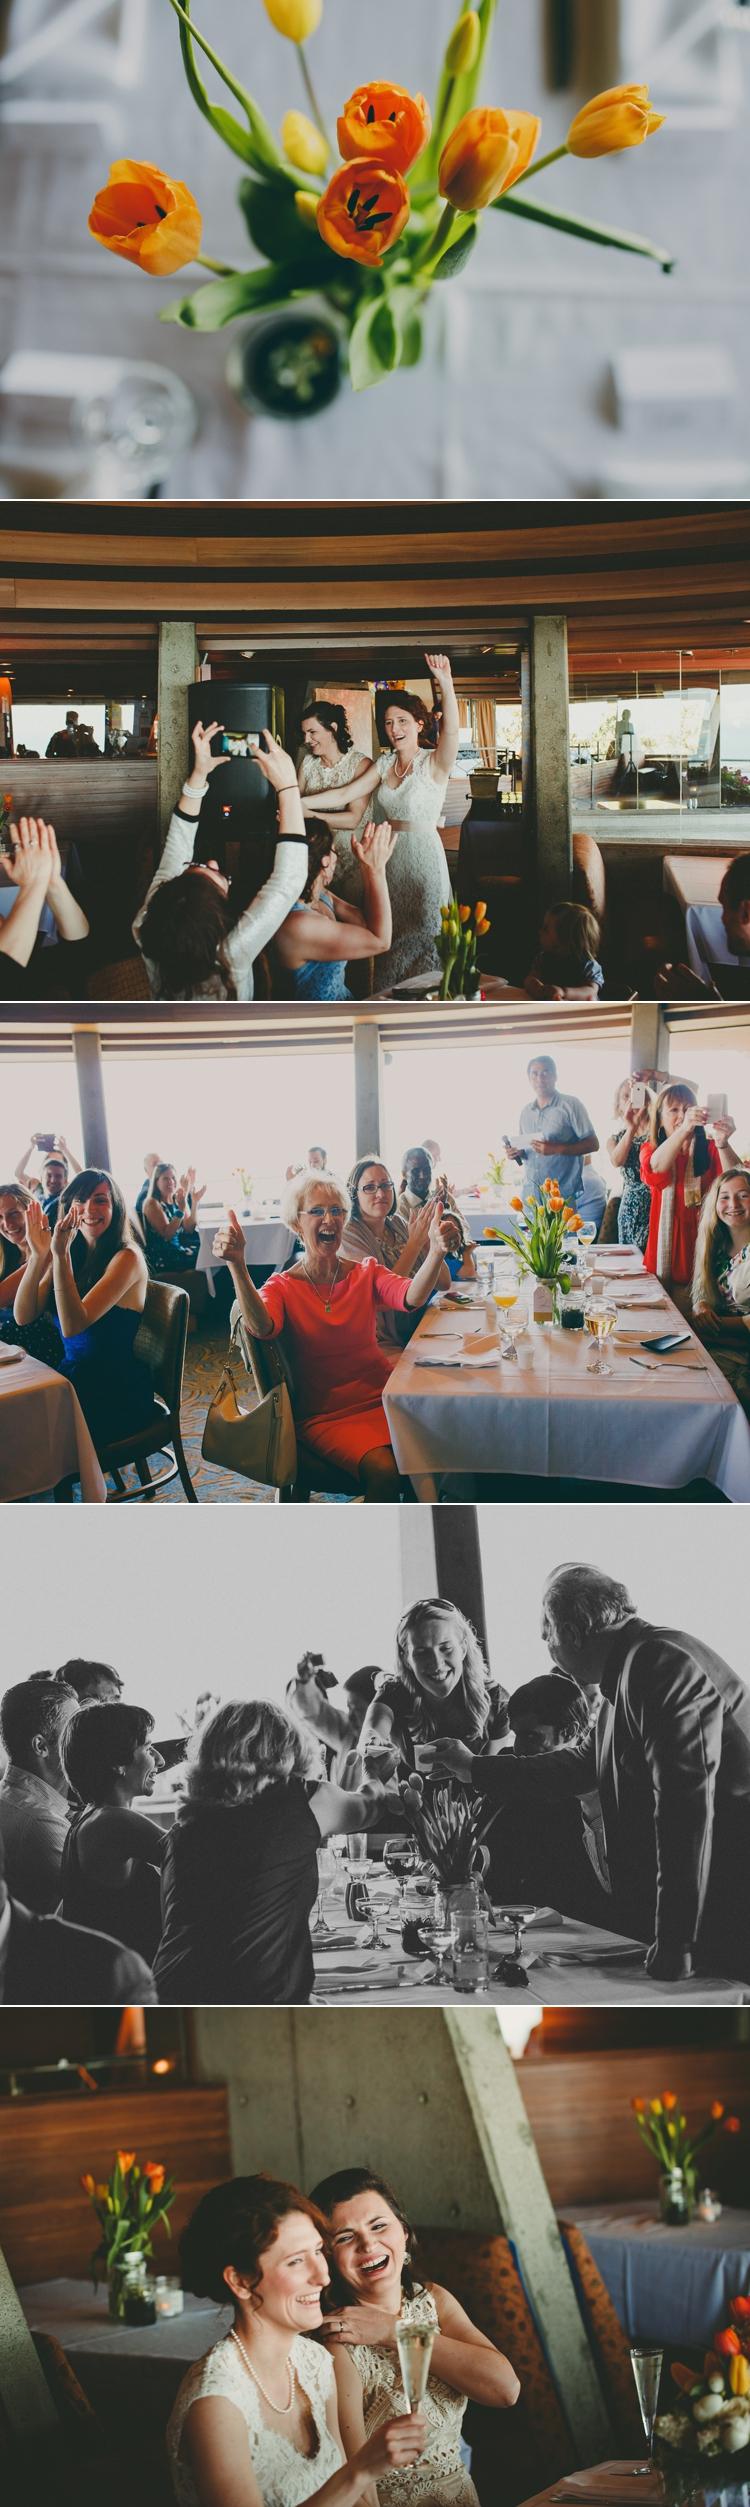 Dana Point Wedding Photographer